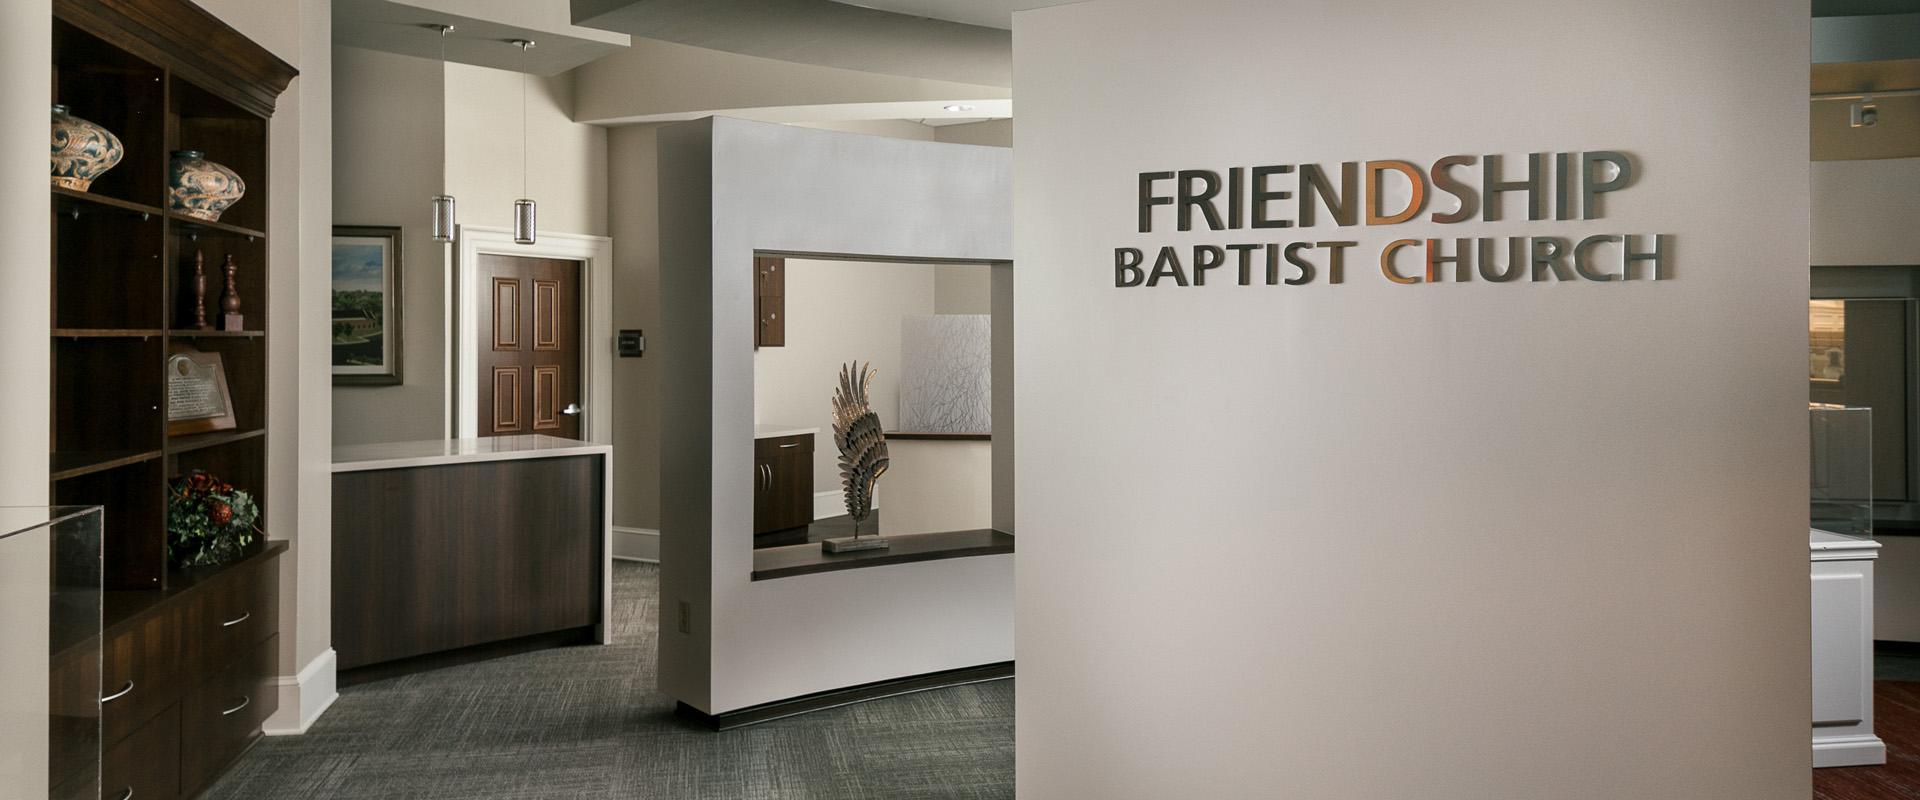 Friendship Baptist Church - Interior